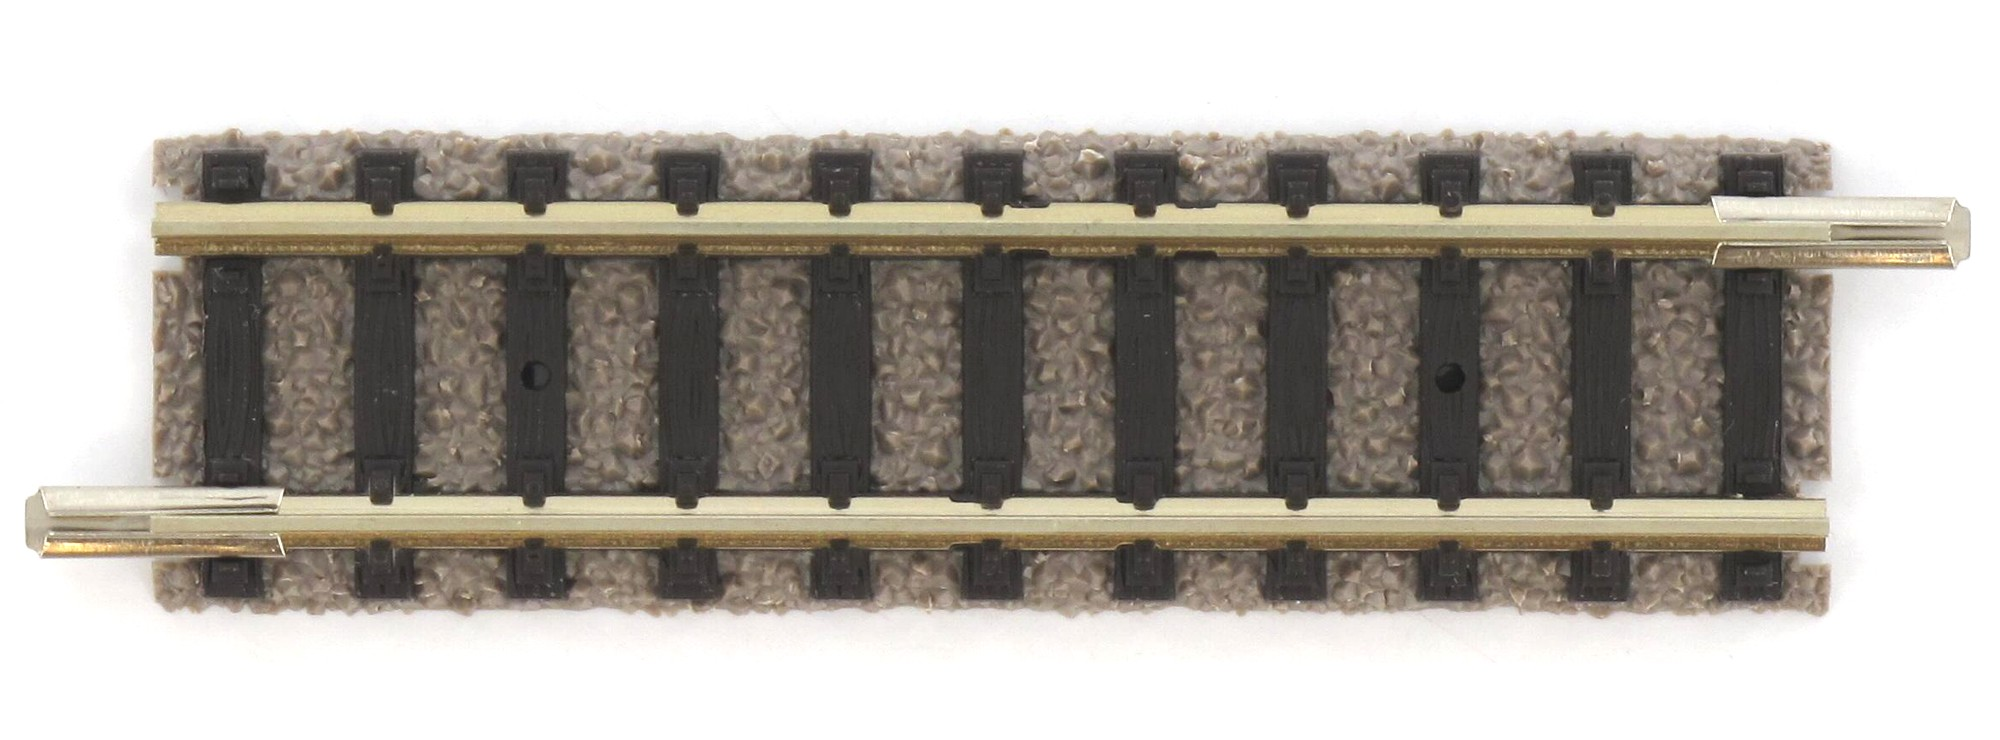 Fleischmann N 9102 GLEIS gerade 57,5mm NEU/&OVP Piccolo